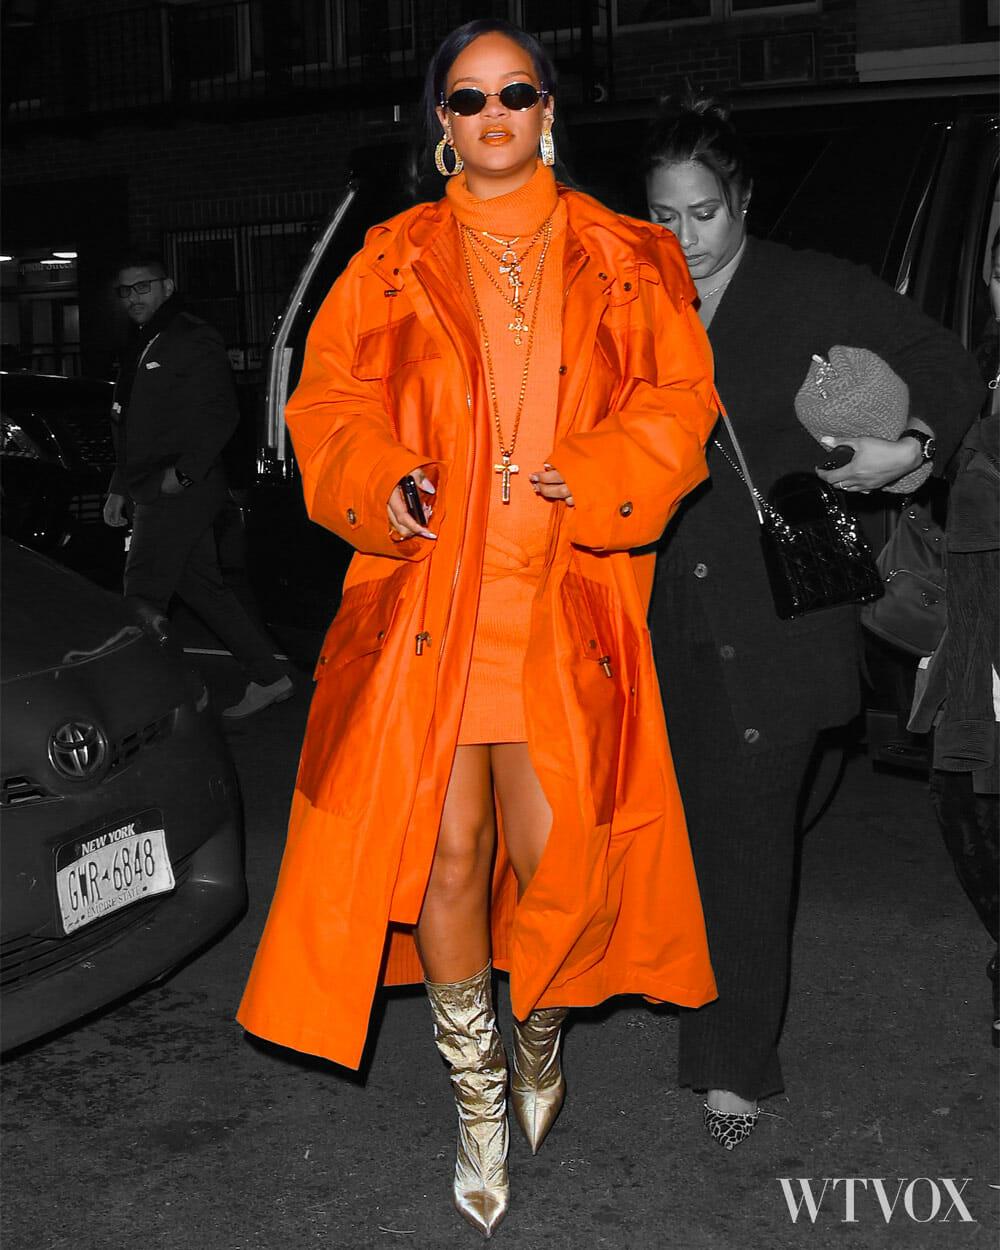 Rihanna wearing streetwear outfit - orange colour